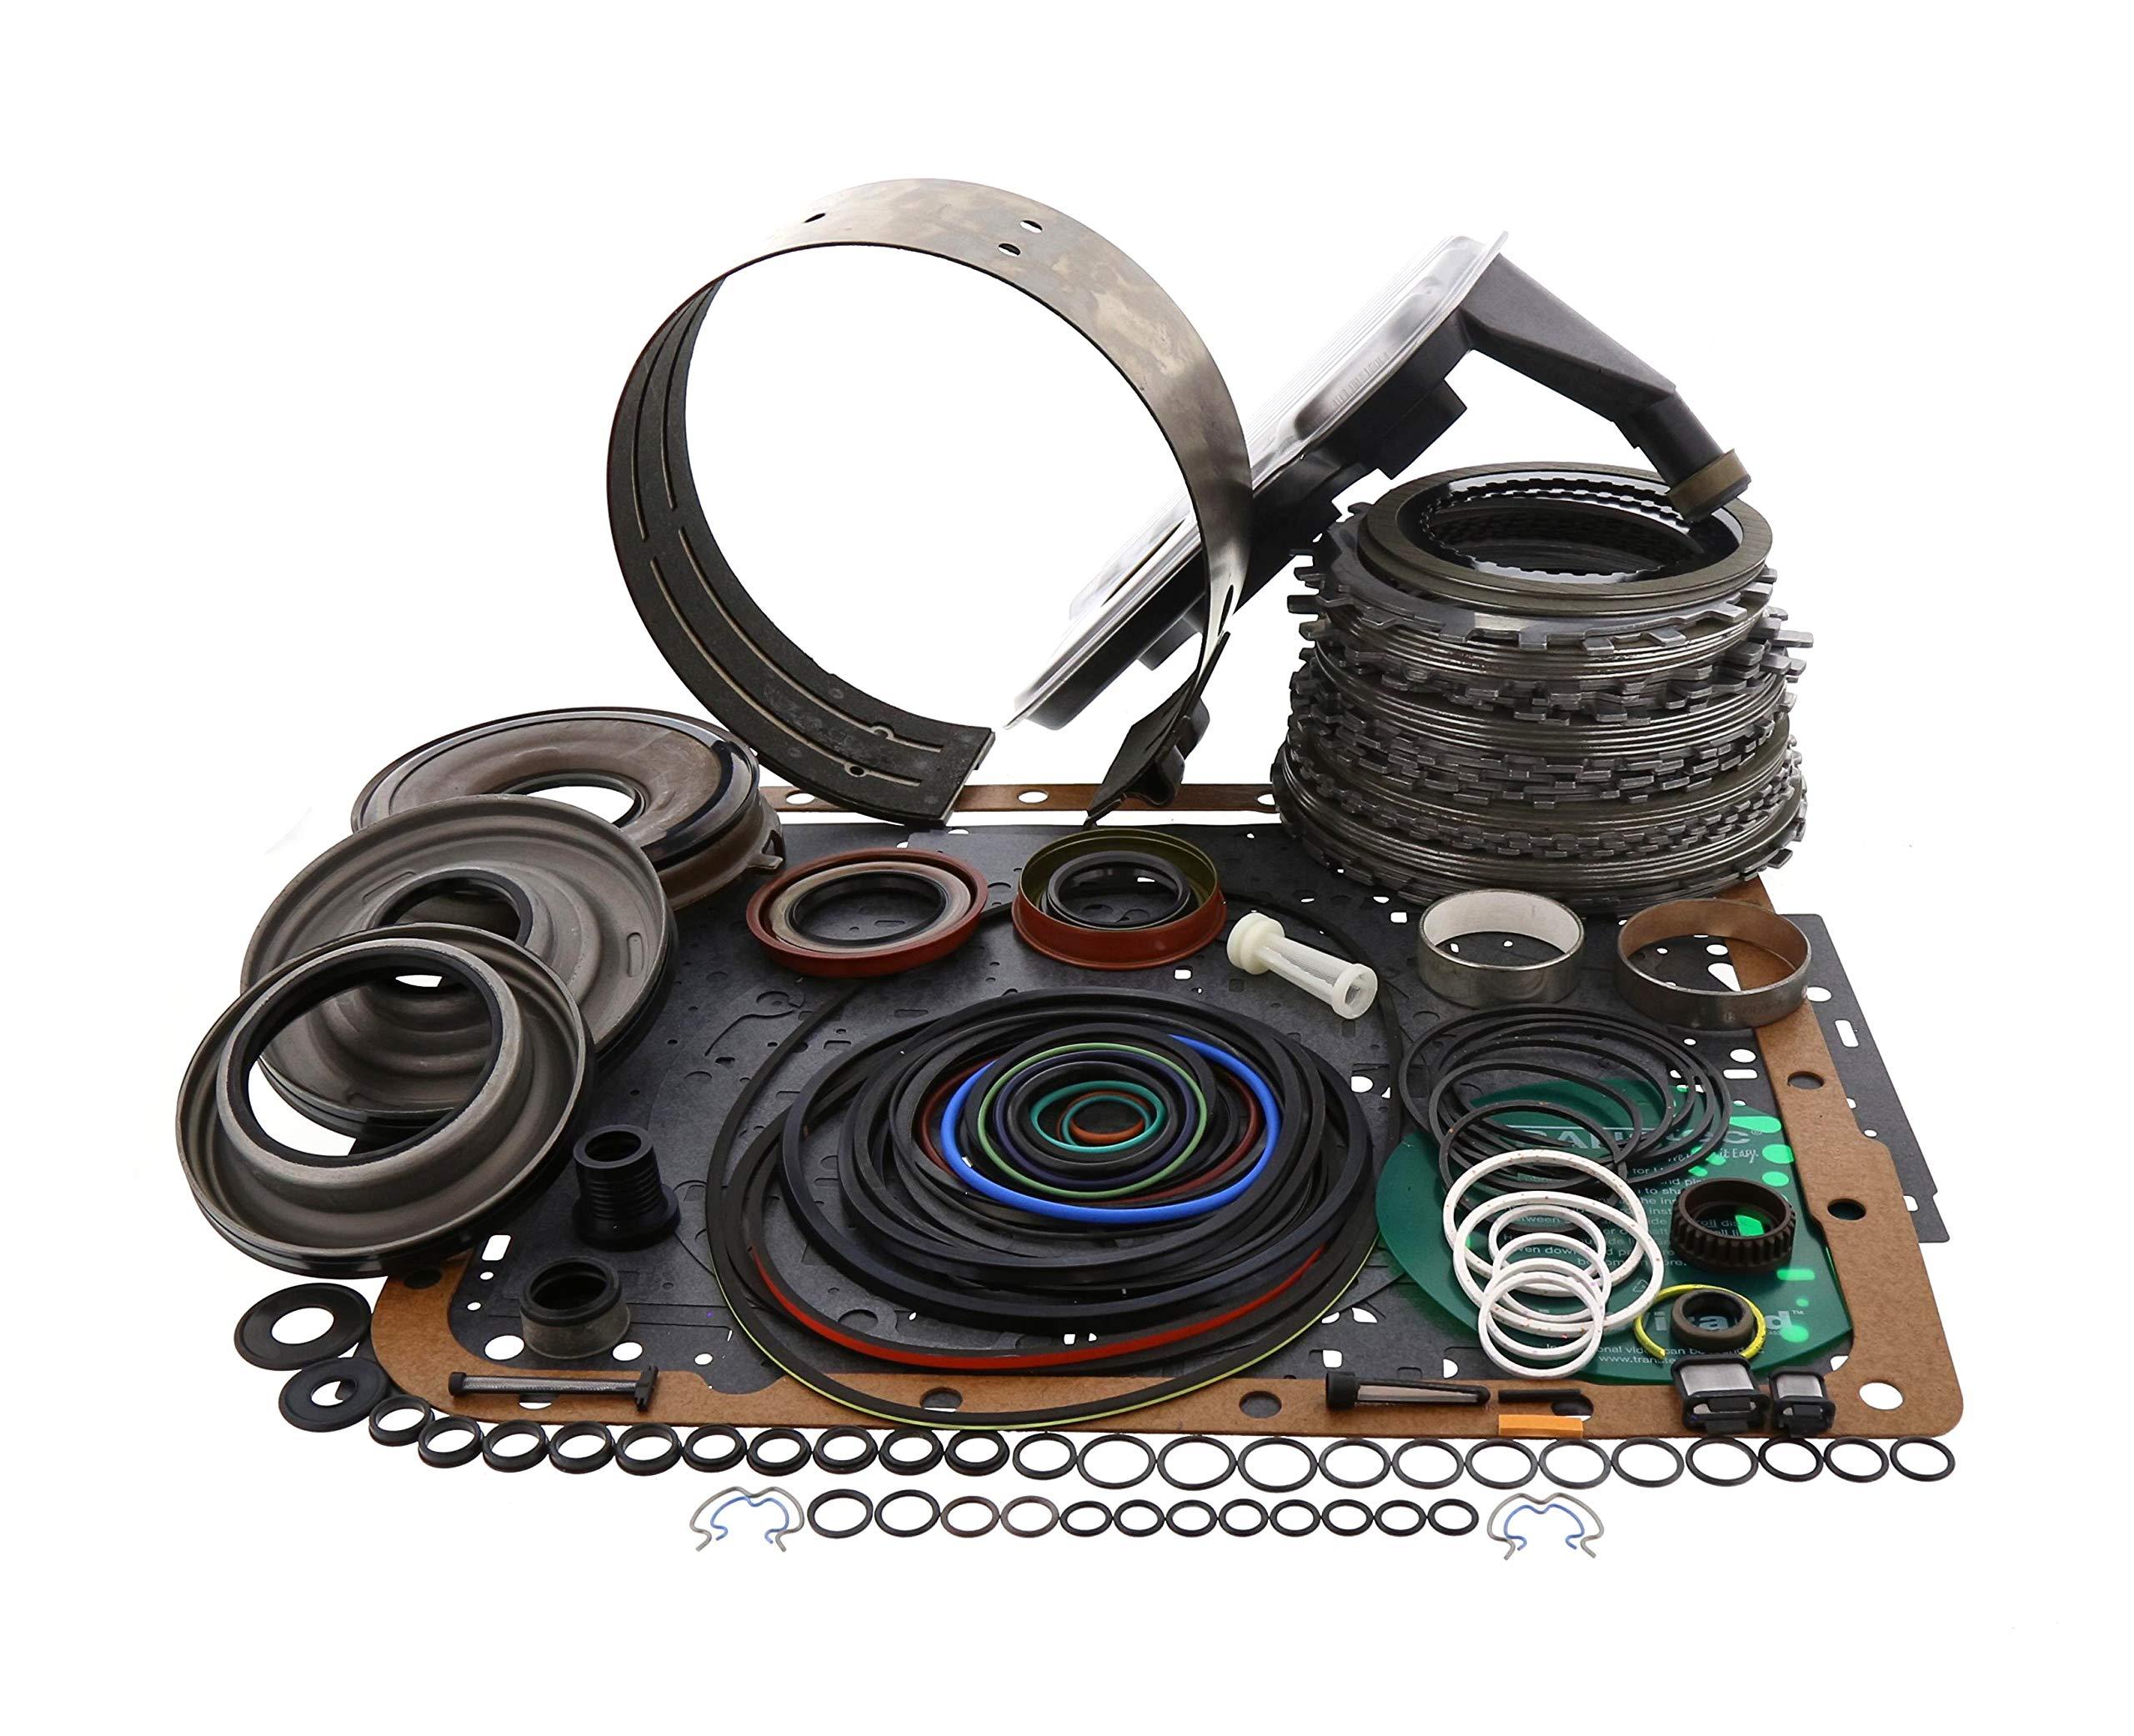 Chevy GM 4L60E Alto Master Level 2 Rebuild Kit 1997-2003 Deep Pan Filter